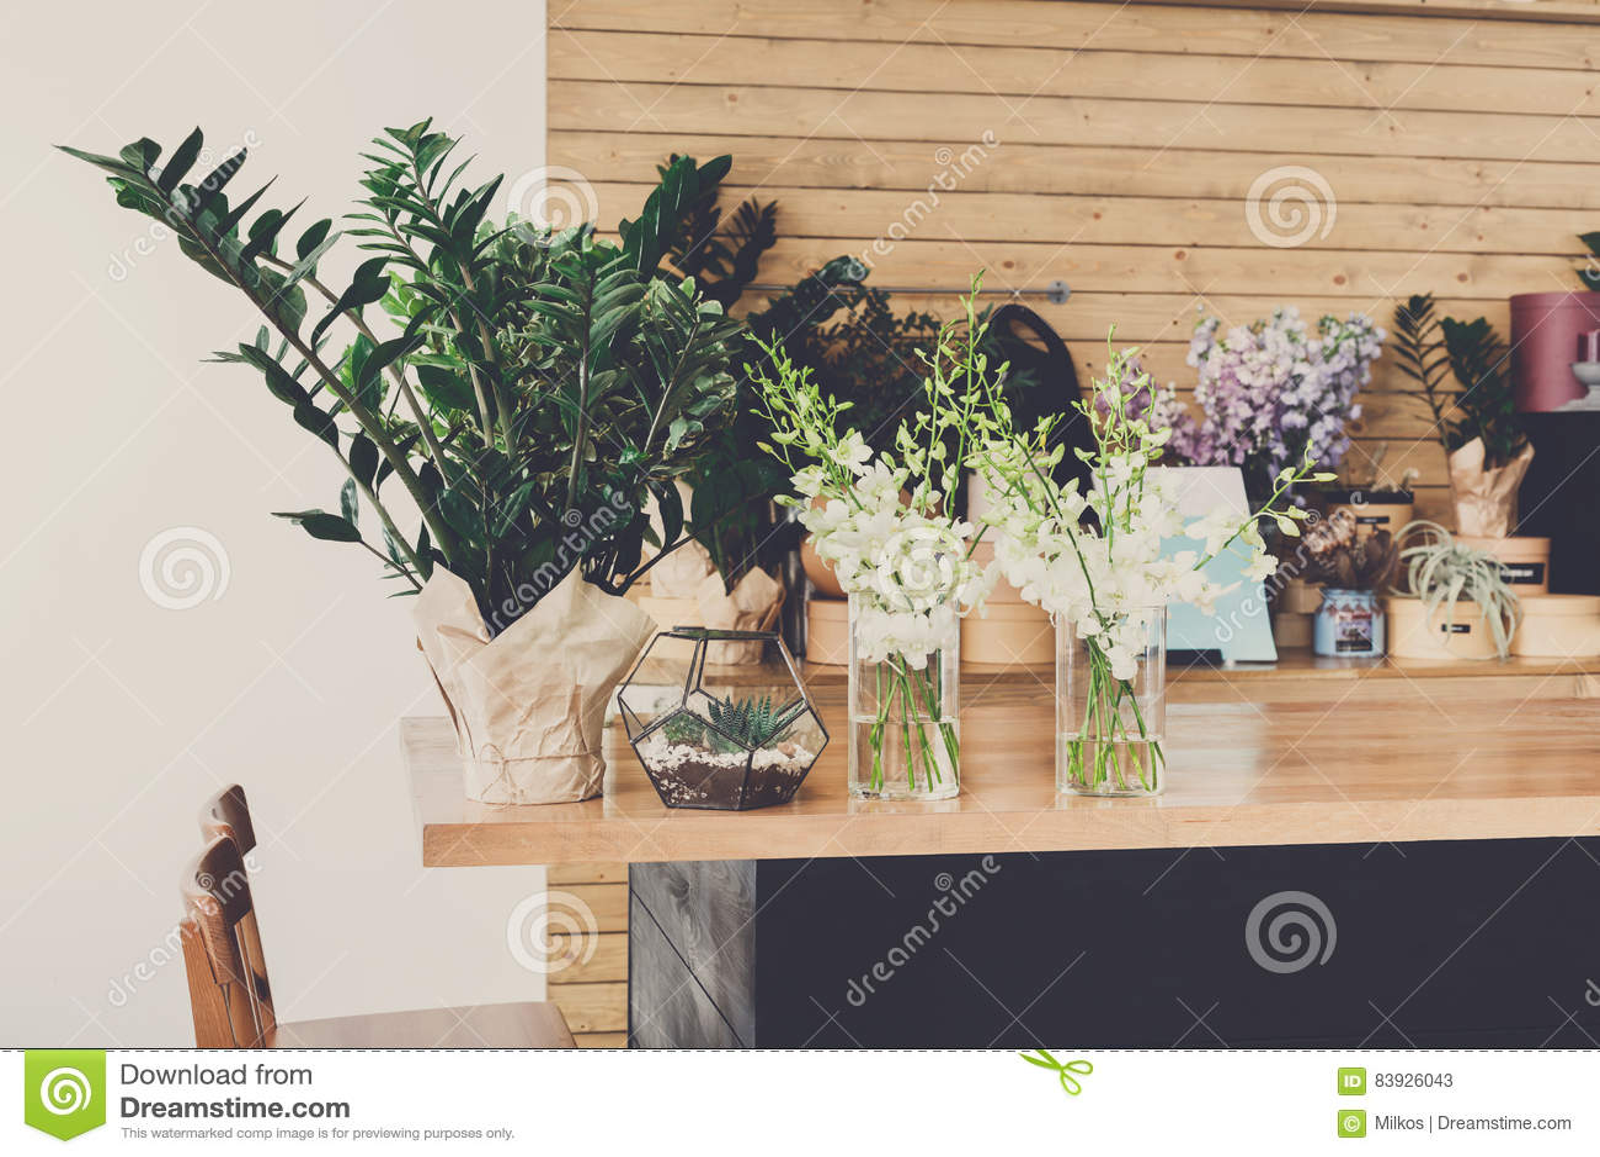 Flower shop interior, small business of floral design studio